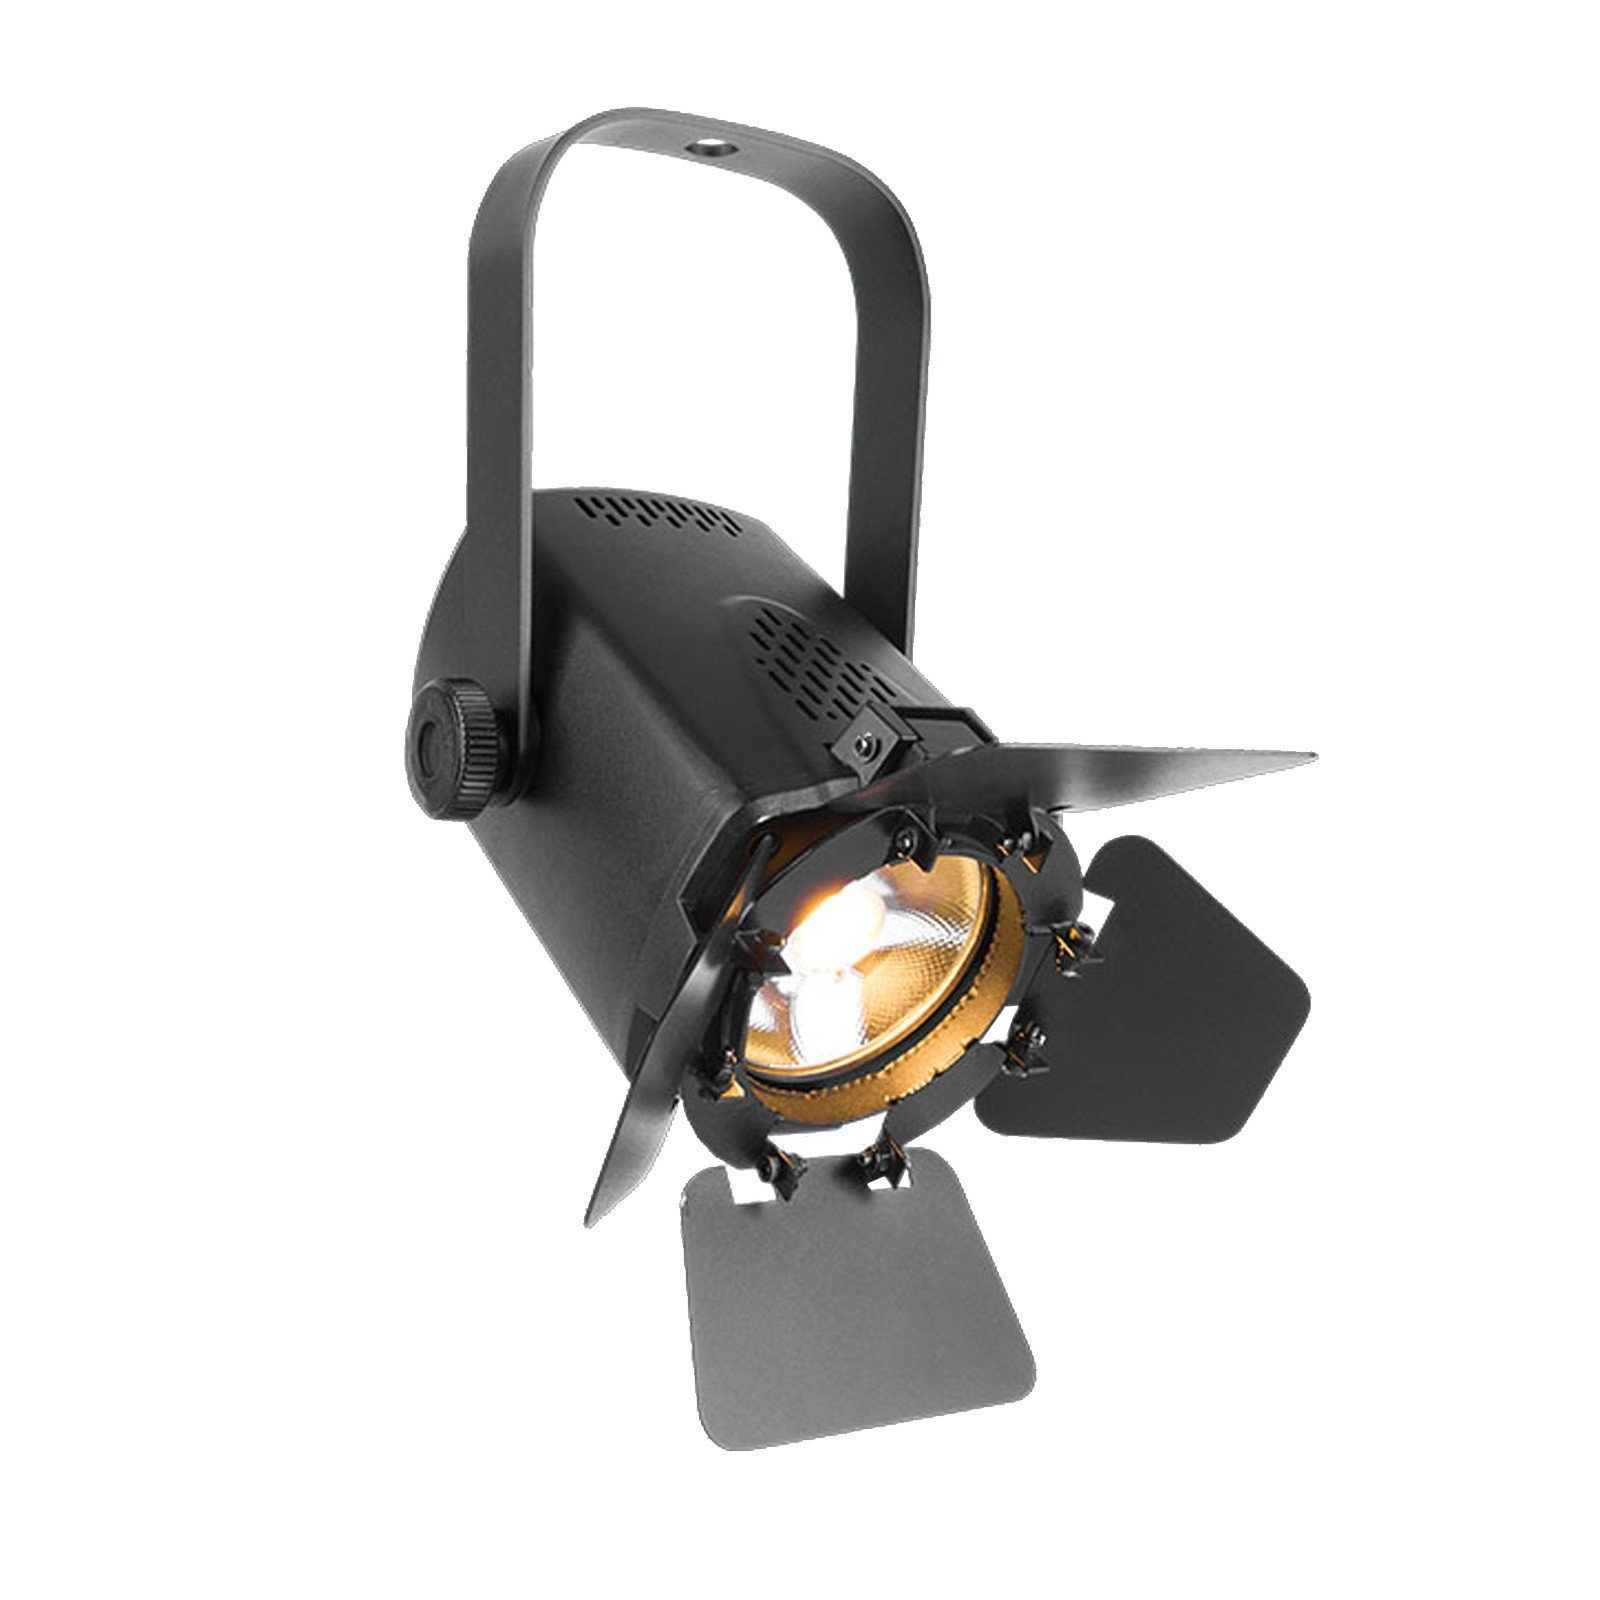 Chauvet Eve TF-20 Black Soft Edge Accent Luminaire